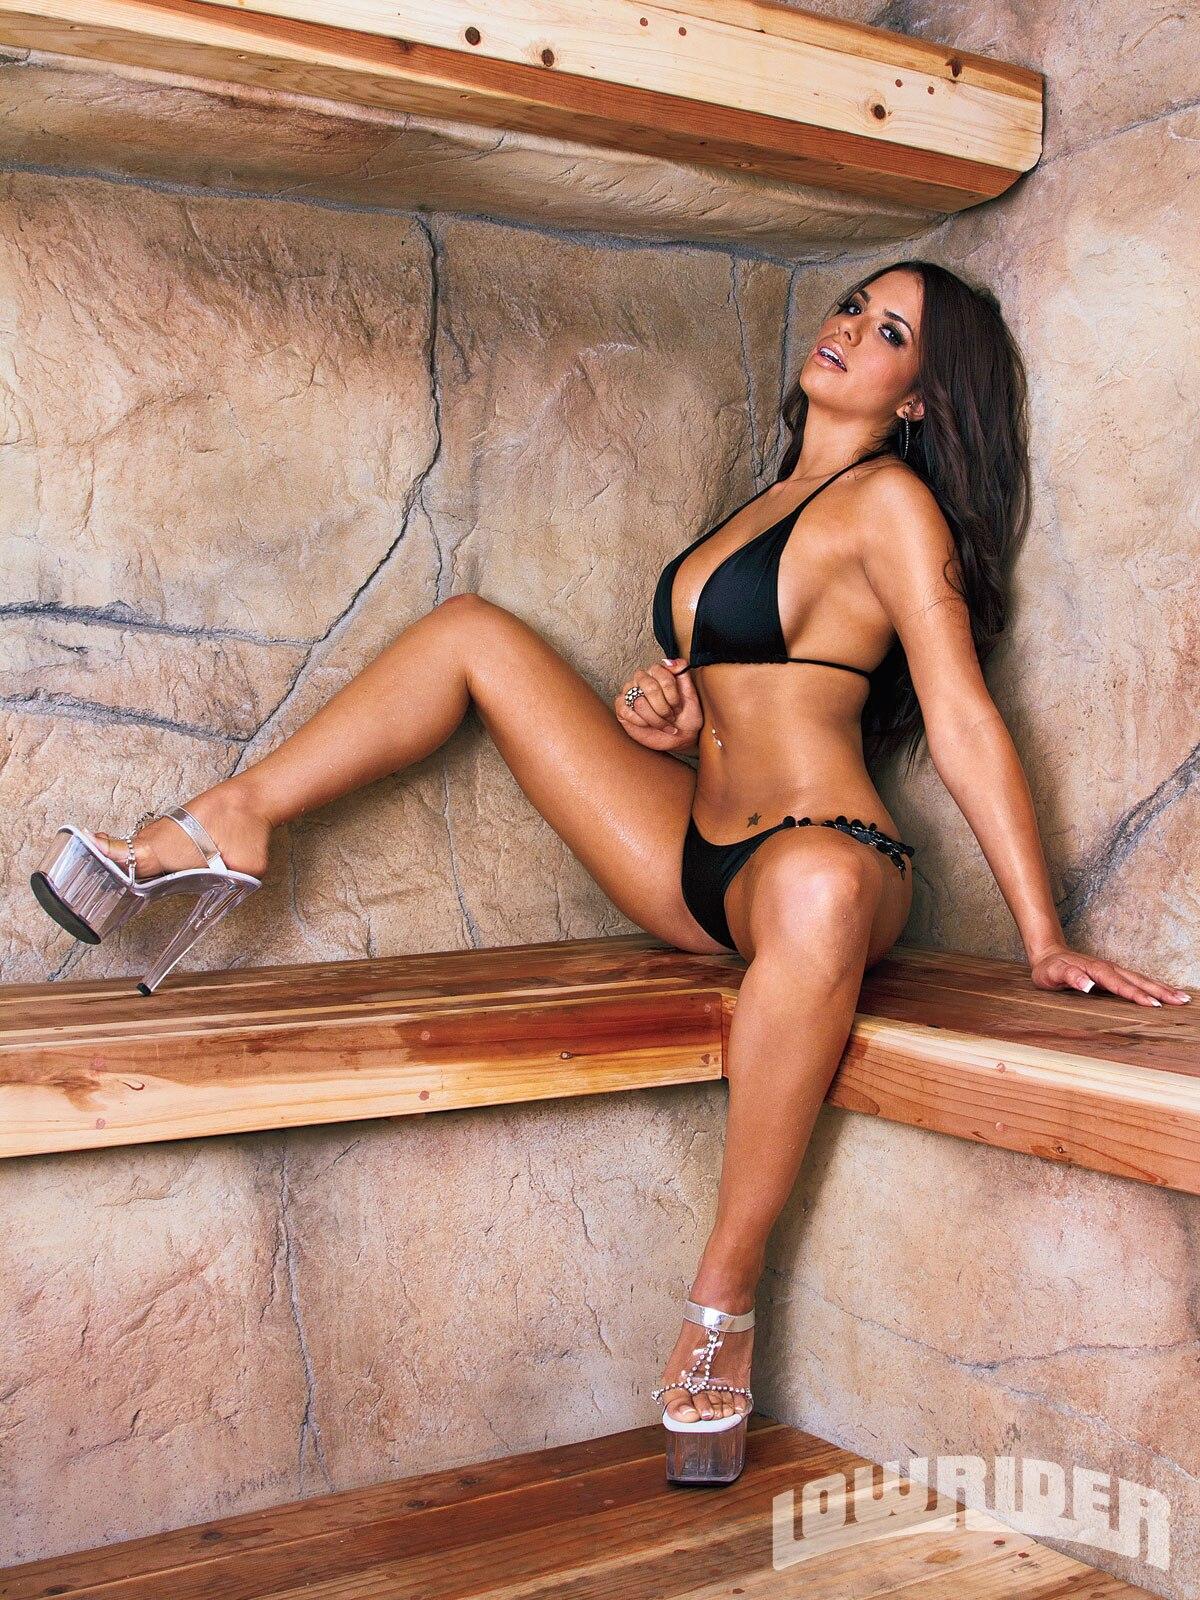 Franchesca Del Carpio - Lowrider Girls Model - Lowrider ...